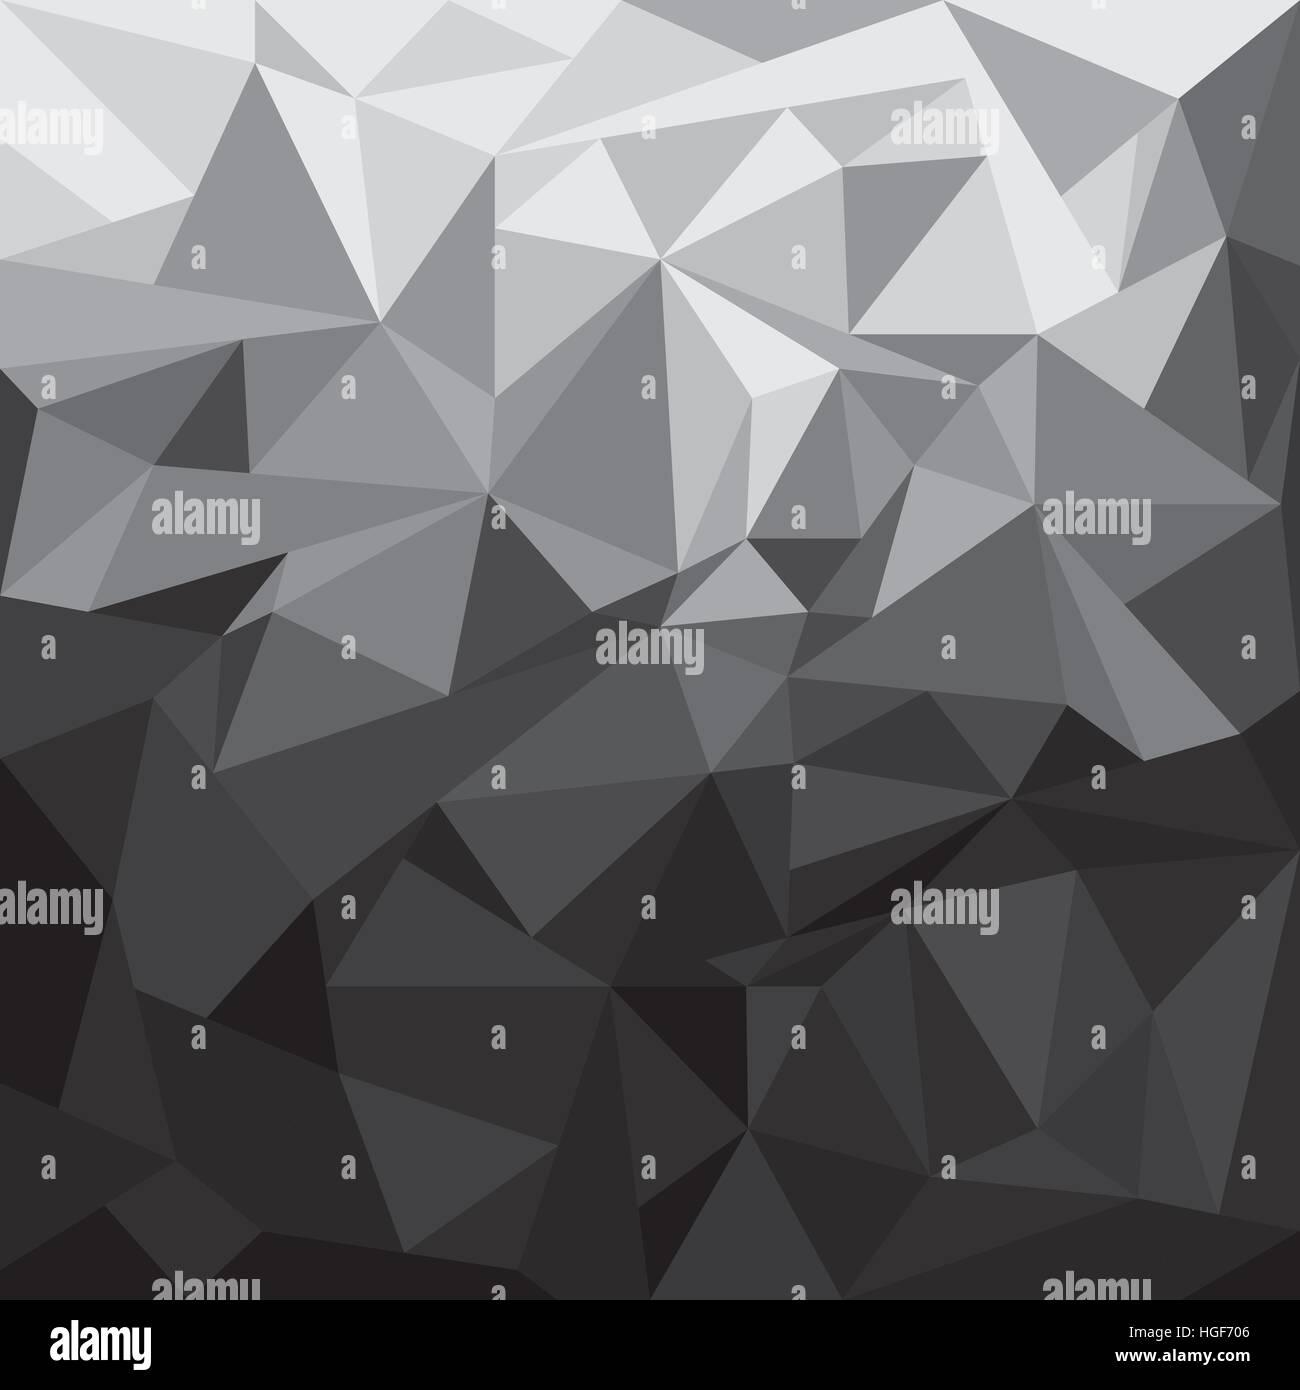 Geometric Illustration Black Grey Wallpaper Backdrop Texture